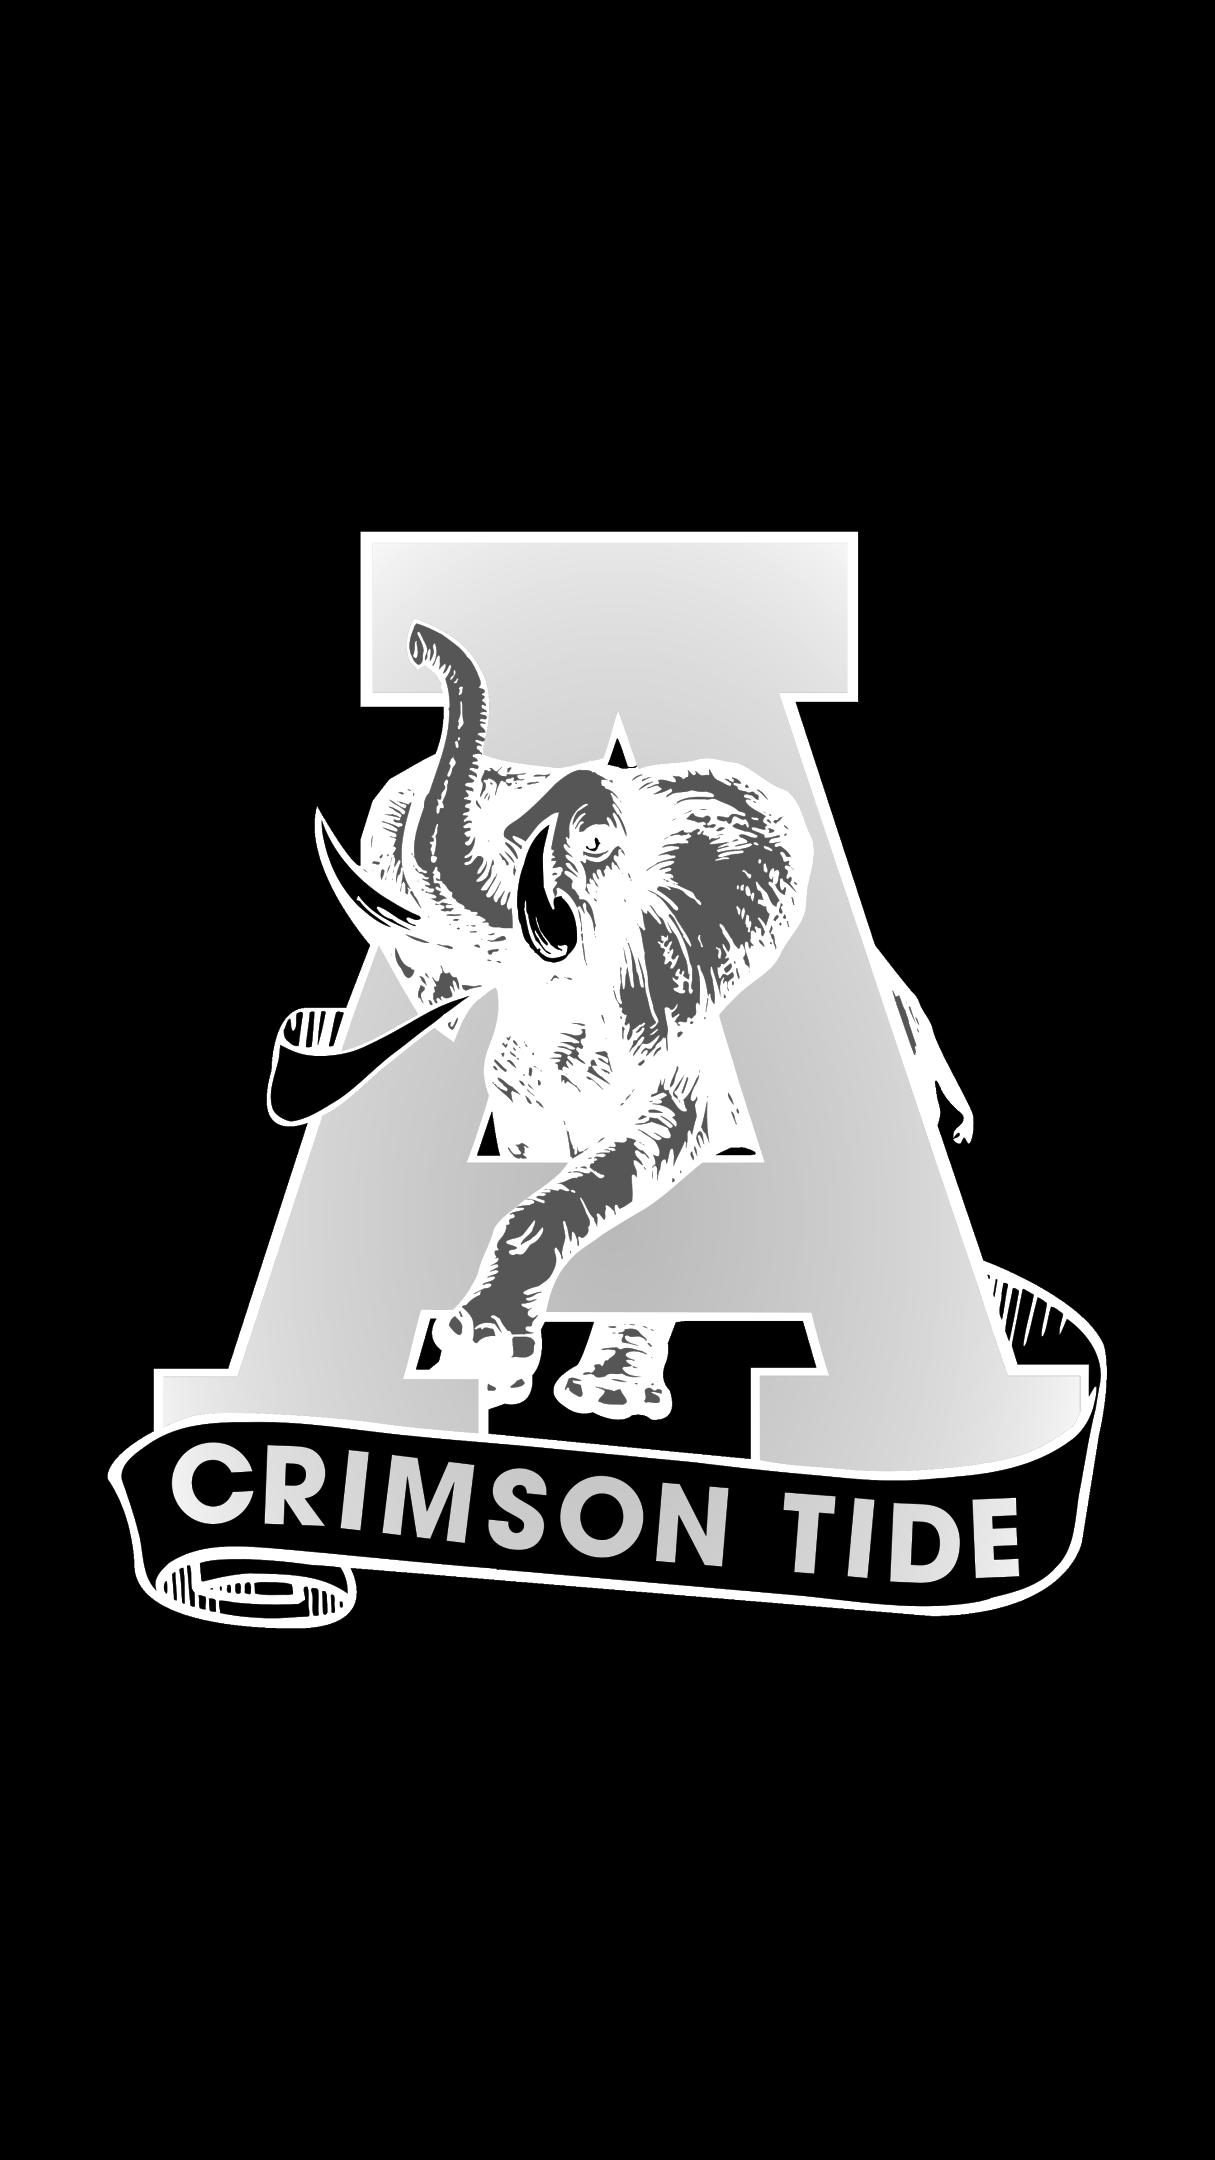 Alabama Crimson Tide Football Wallpaper Iphone Android 27 High